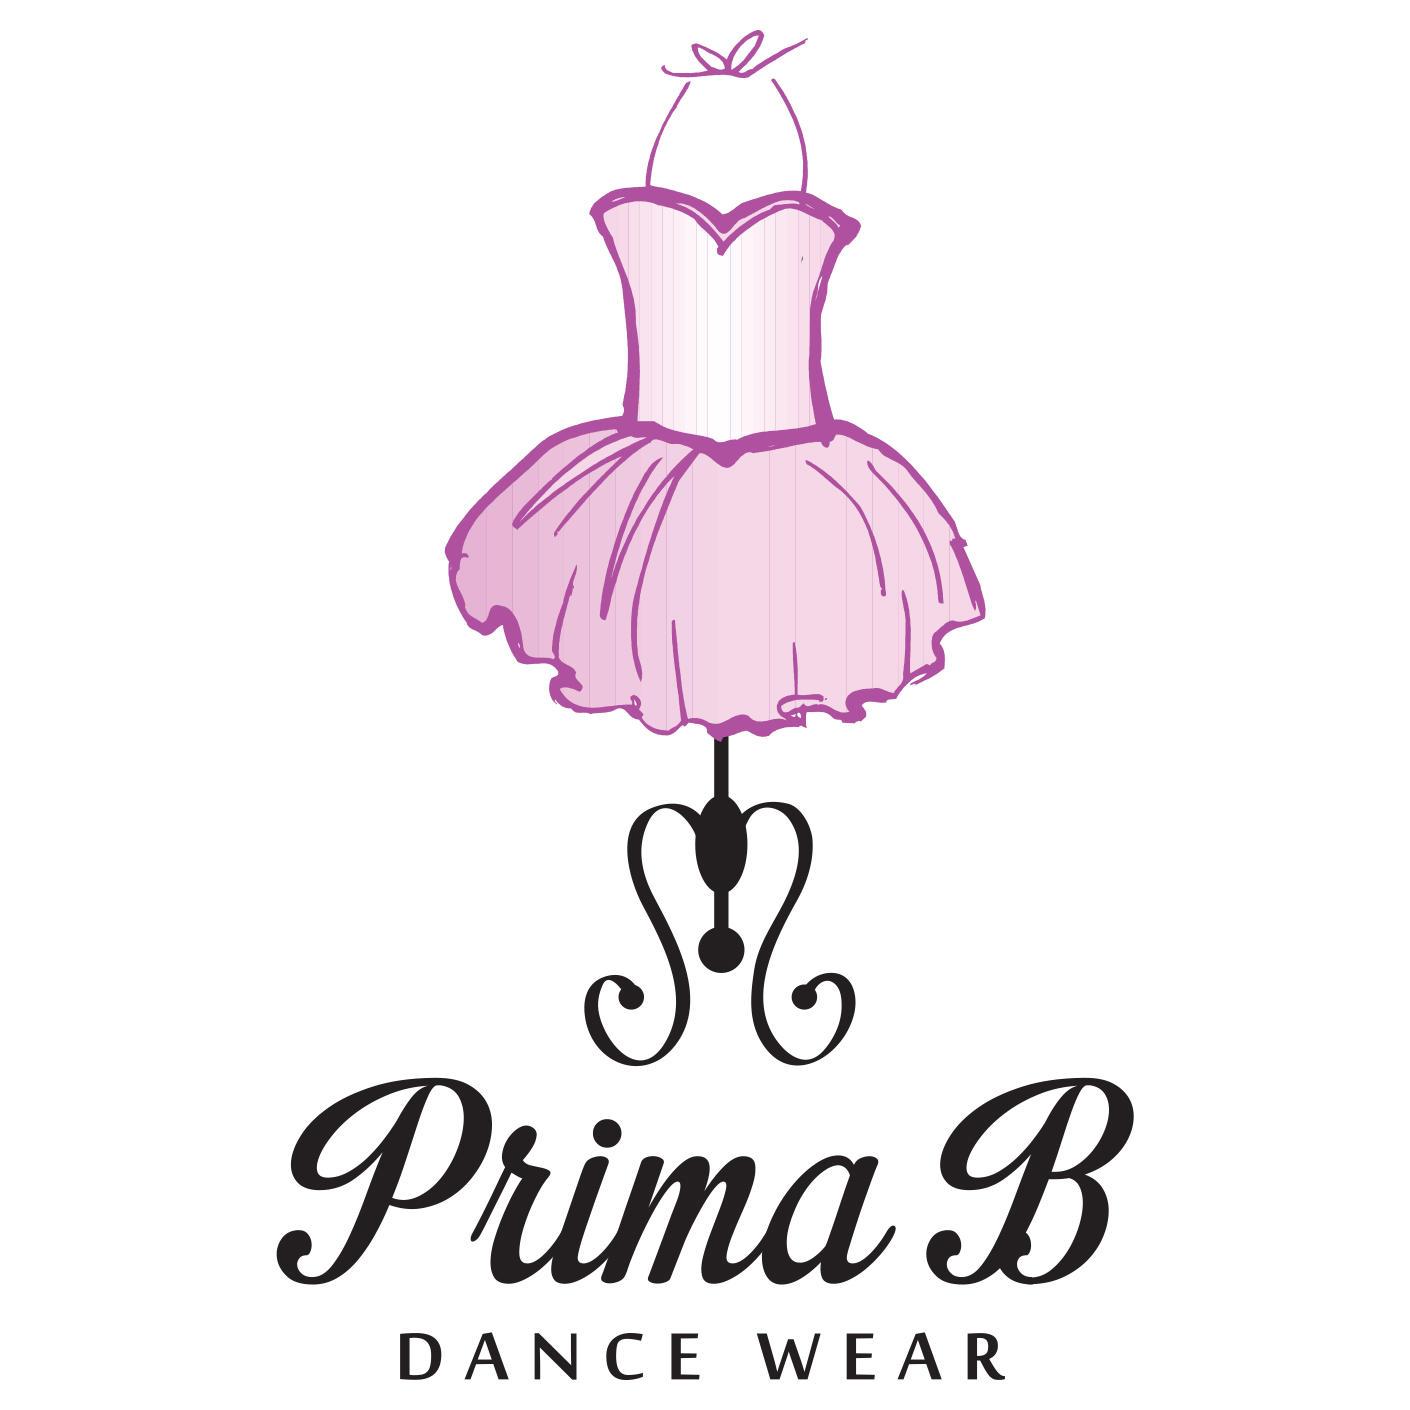 Prima B Dancewear LLC.